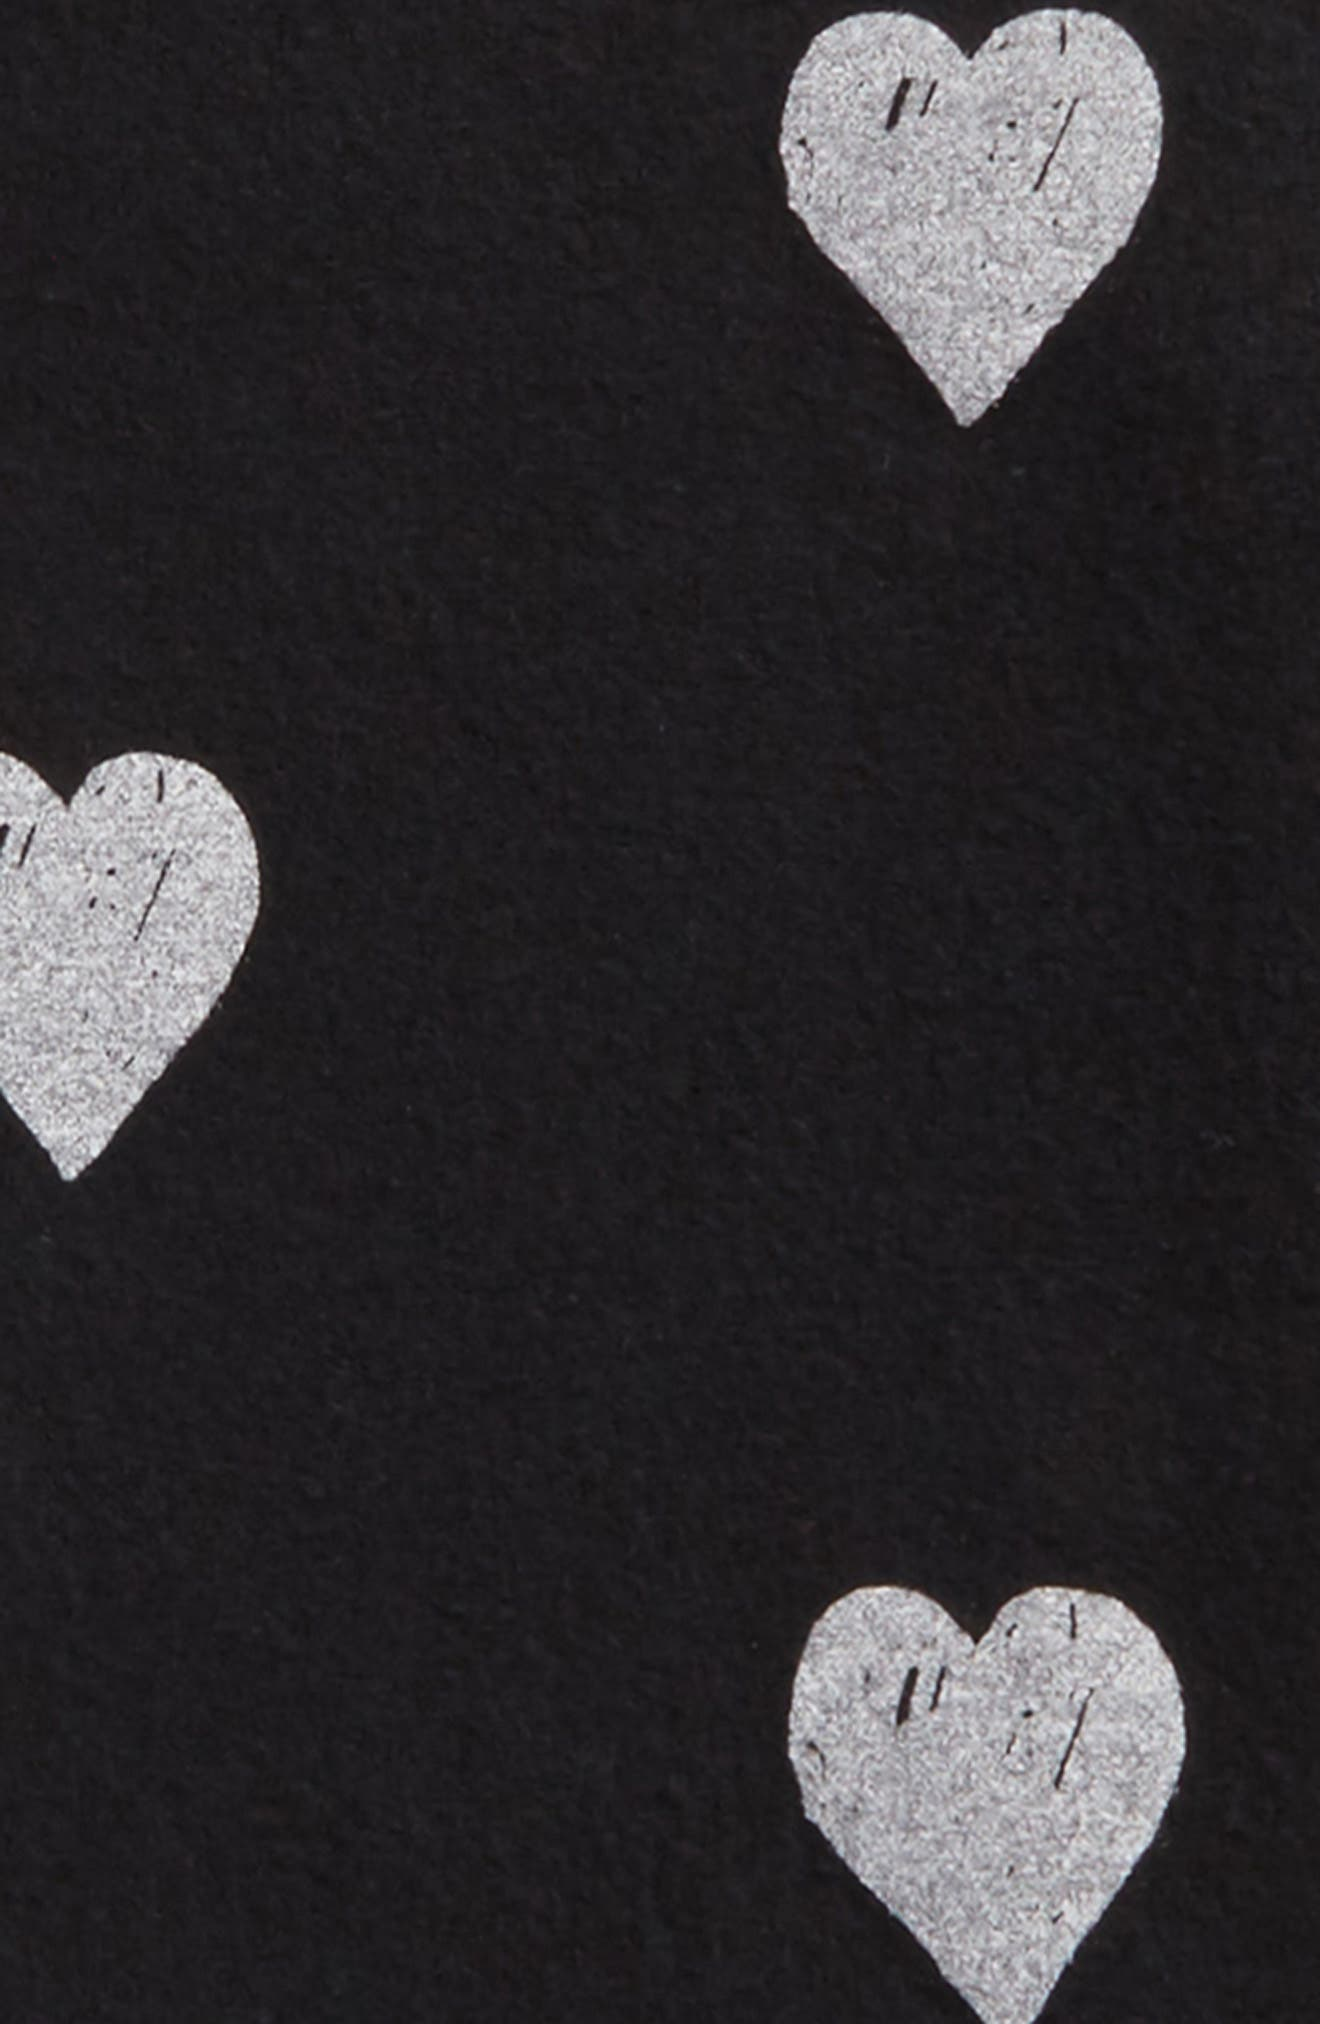 Heart Print Sweatshirt,                             Alternate thumbnail 2, color,                             001